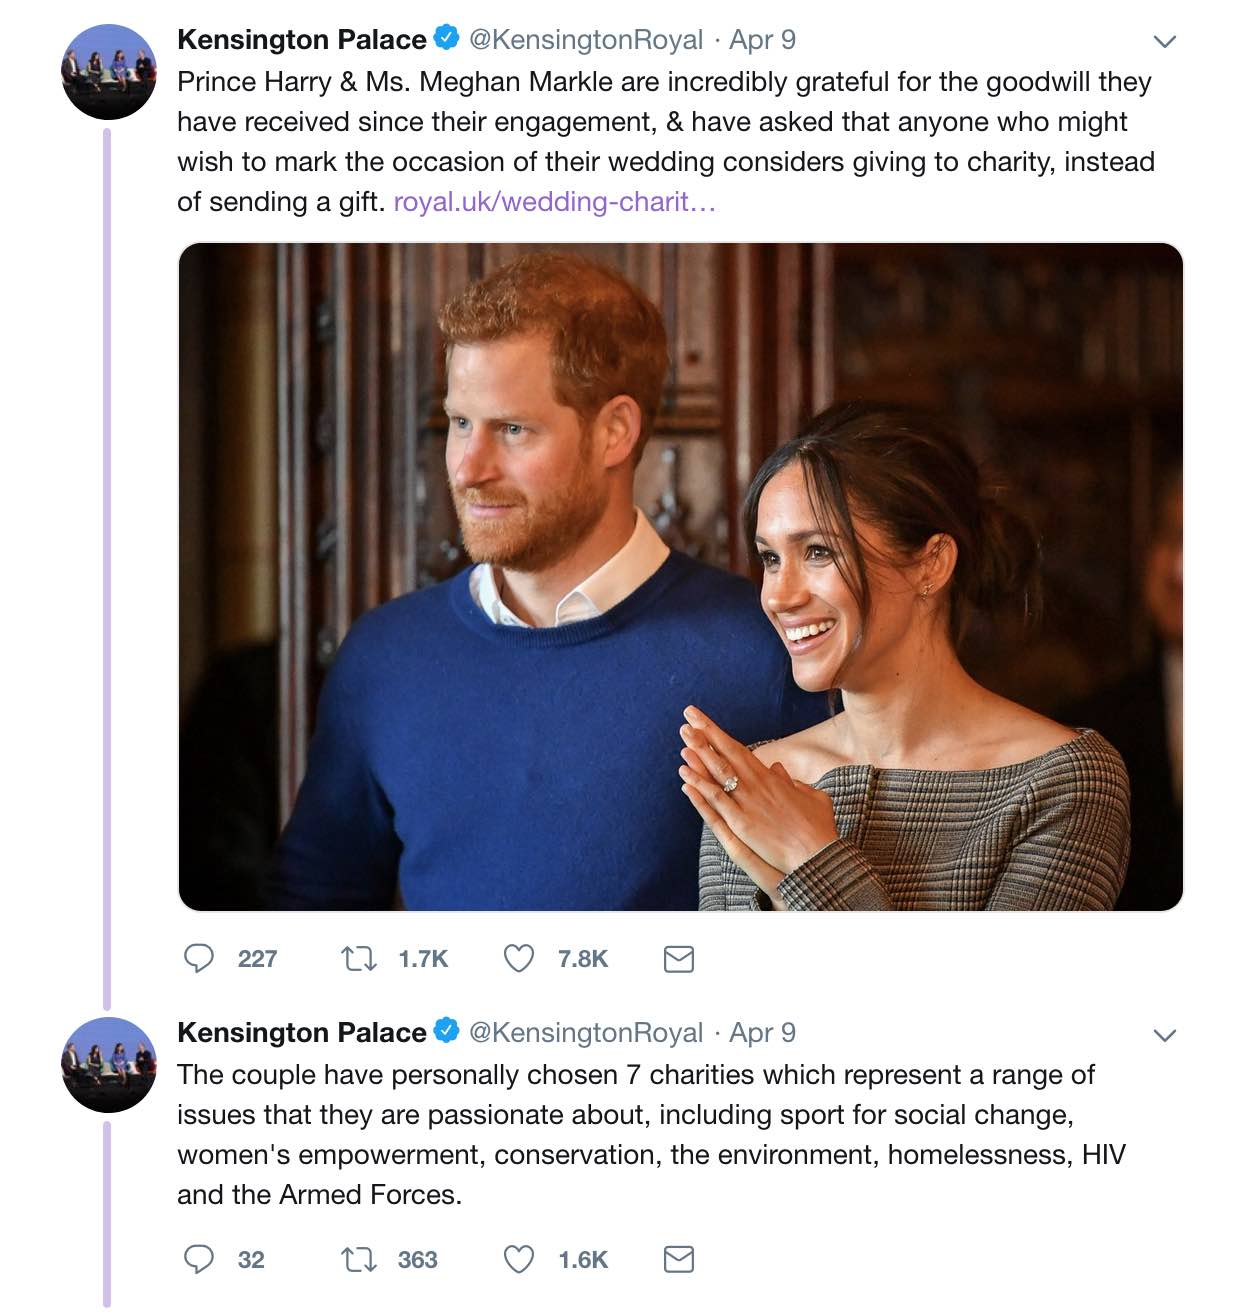 royal wedding donation not gifting